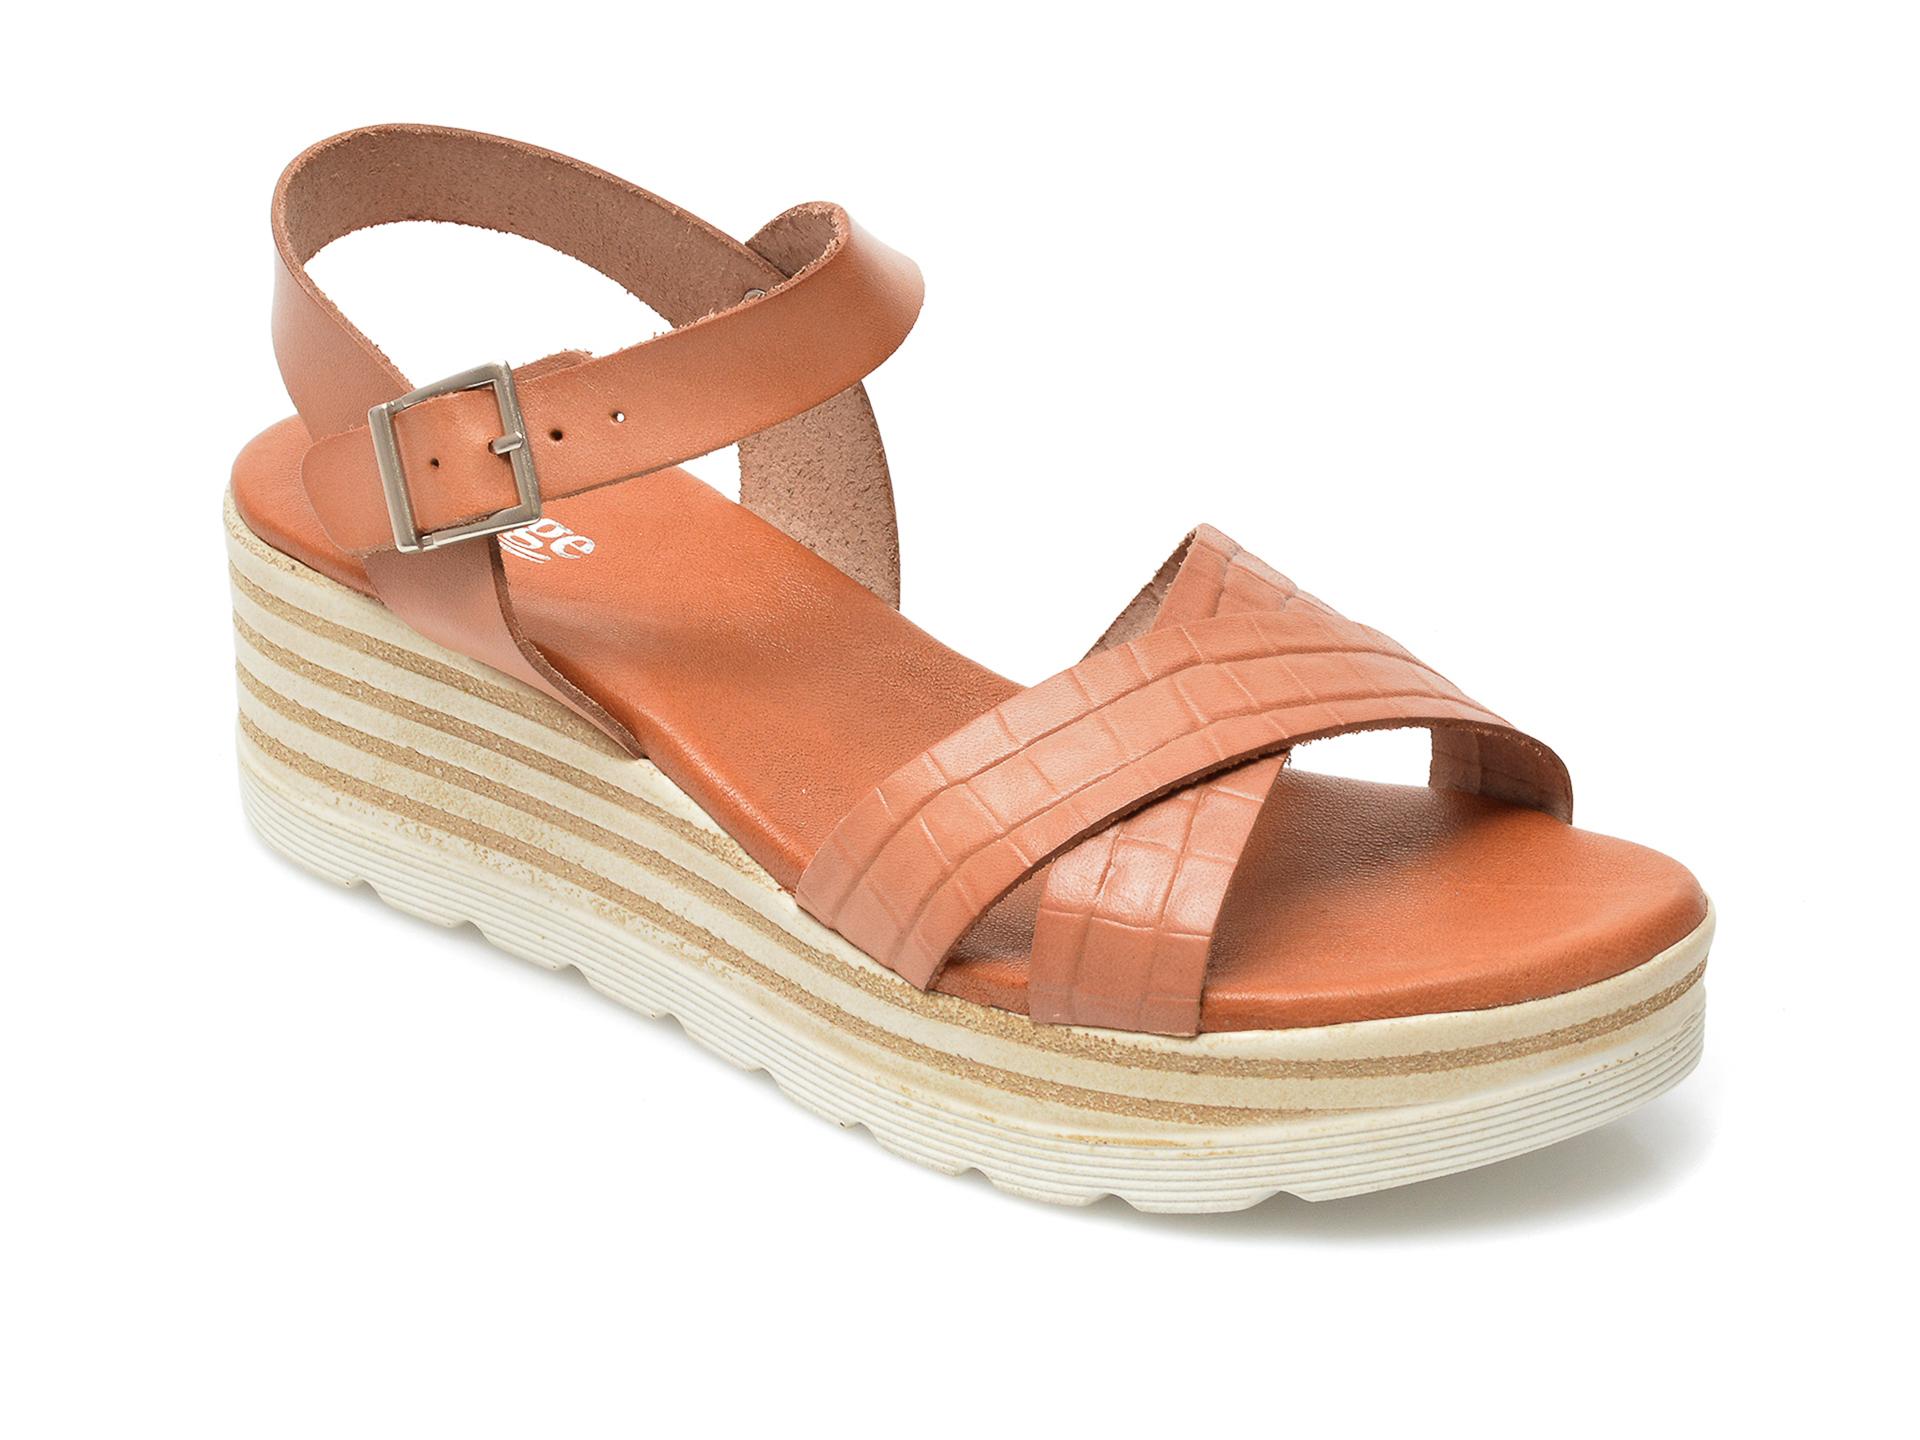 Sandale IMAGE maro, 8110S, din piele naturala imagine otter.ro 2021